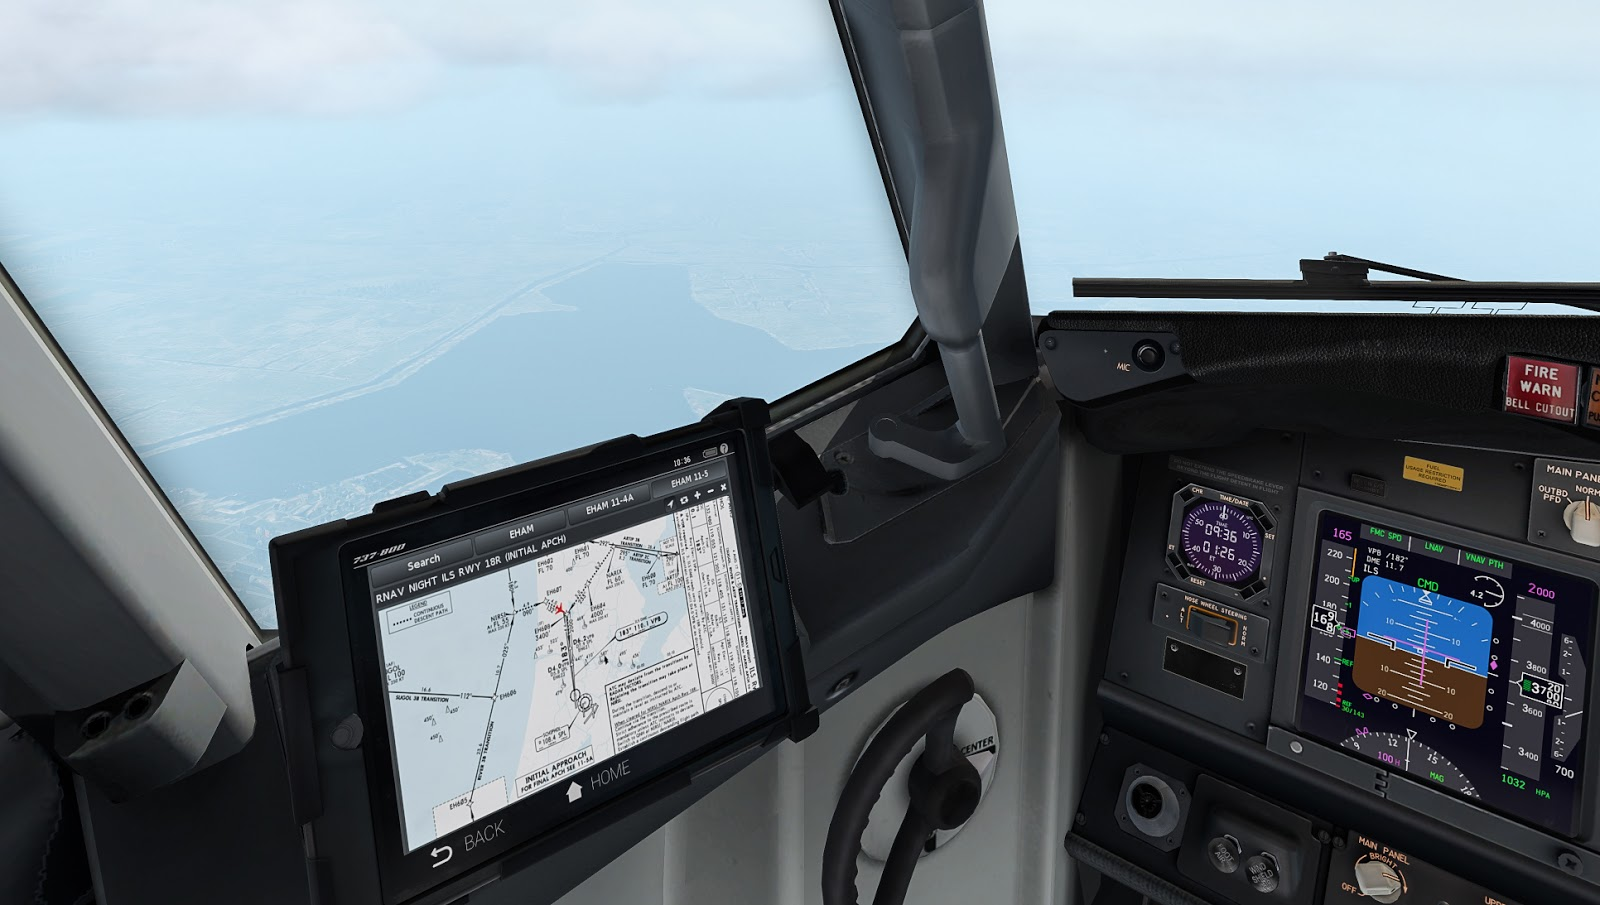 Praising the Zibo Mod Boeing 737